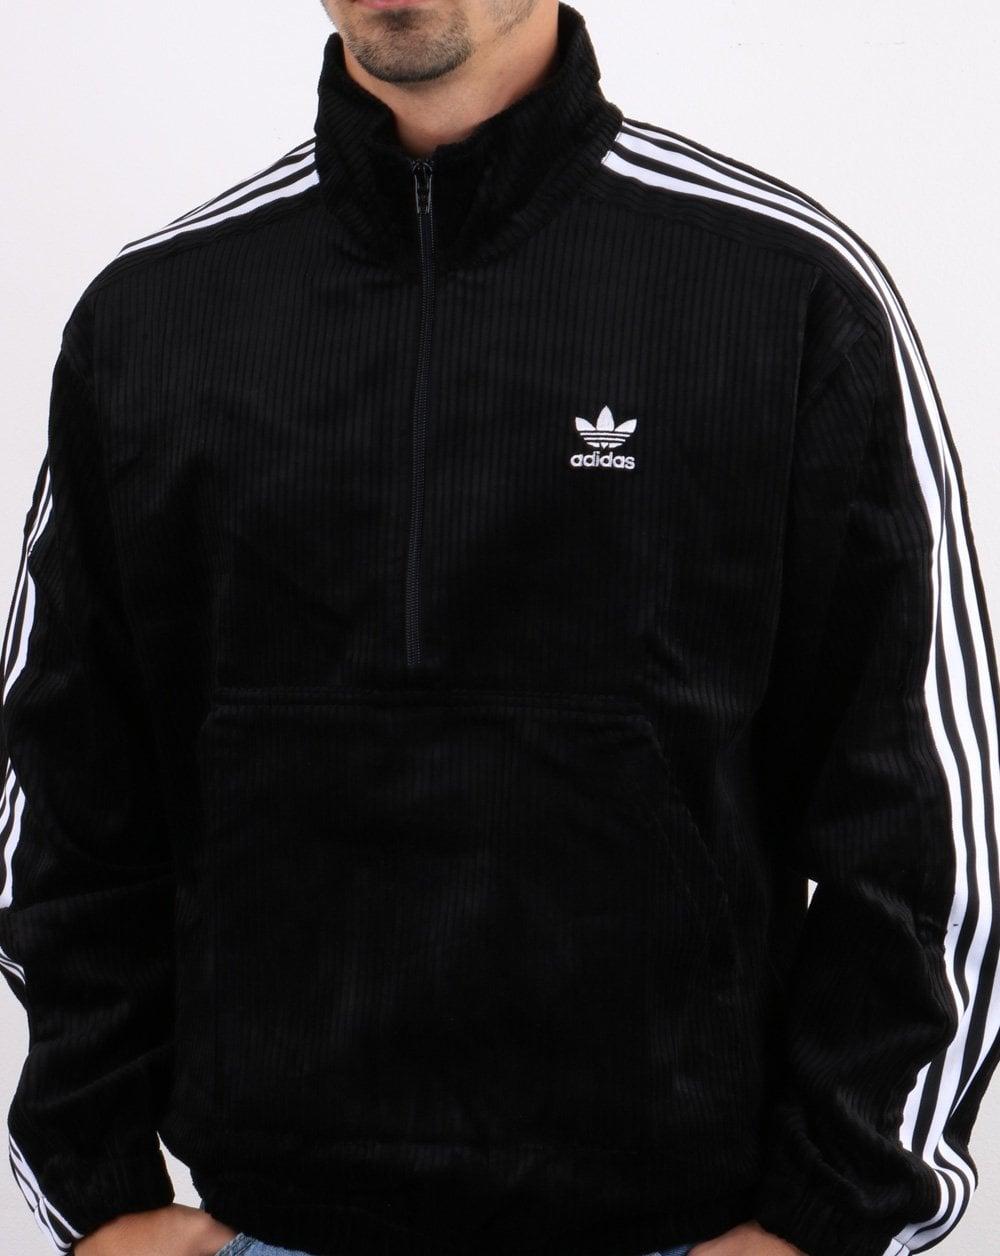 Adidas Originals Cord Half Zip Top